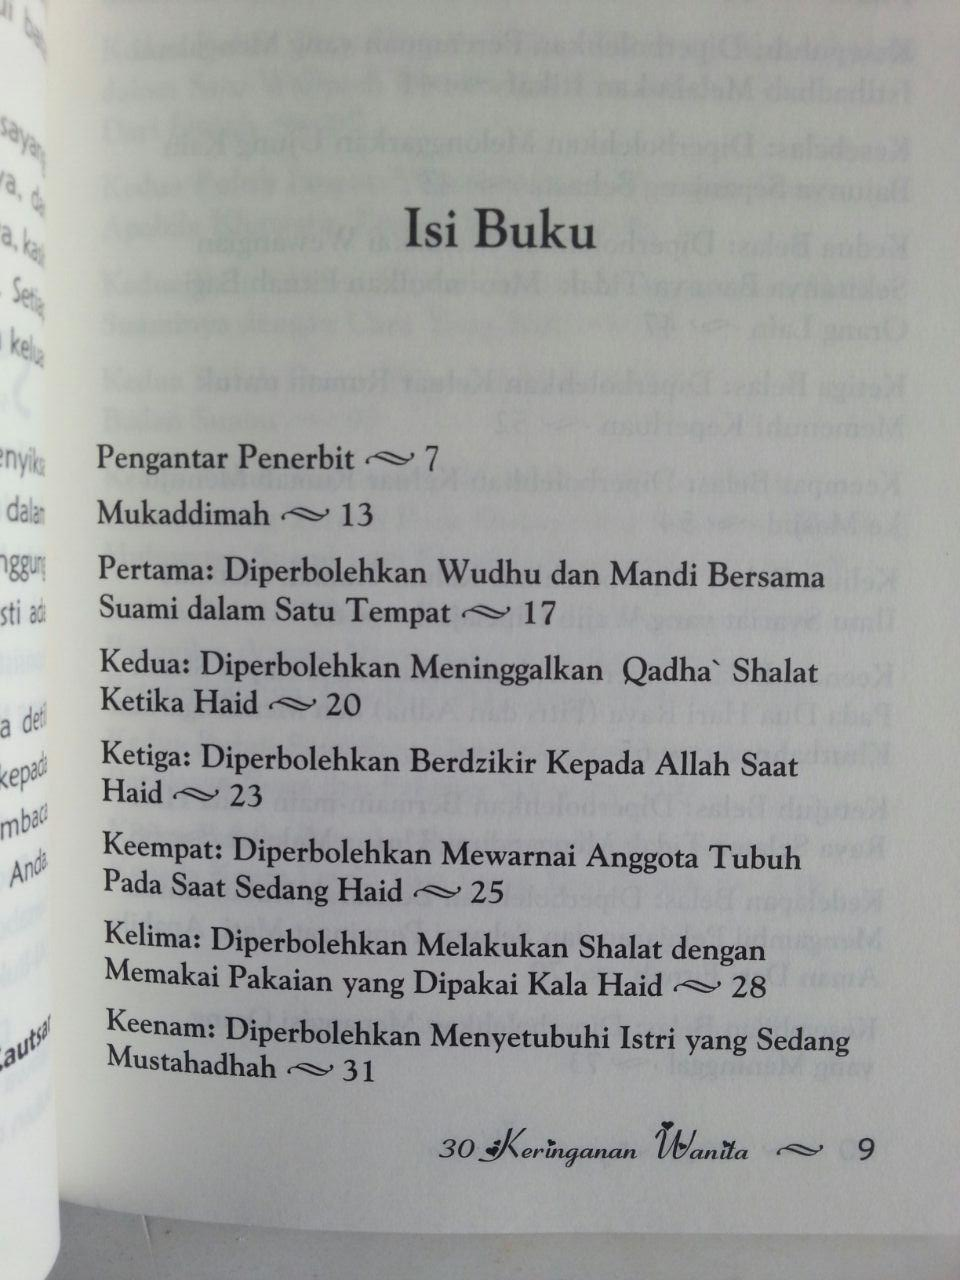 Buku 30 Keringanan Wanita Menurut Syariat isi 2